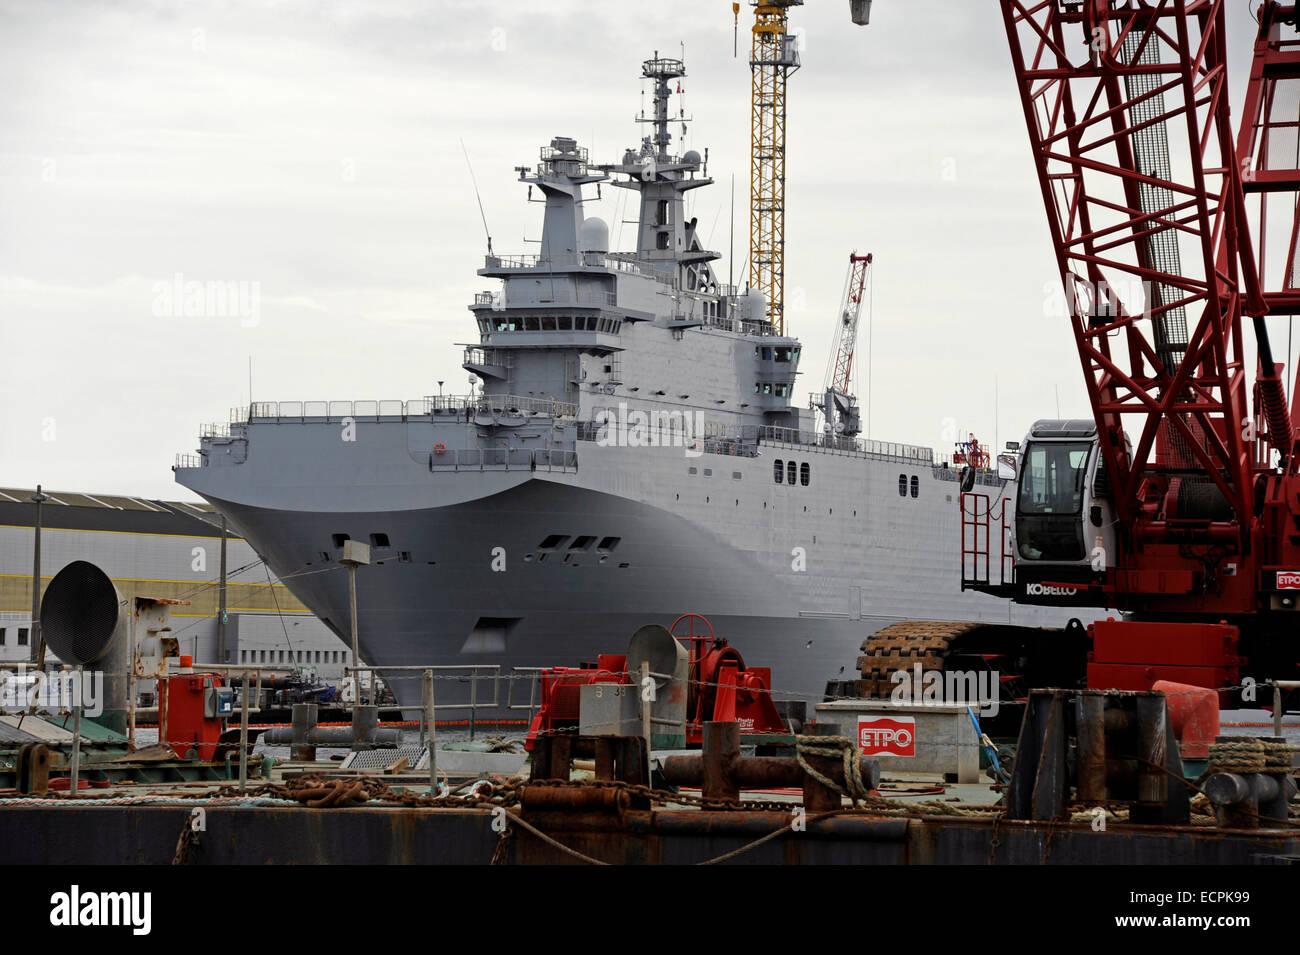 Mistral class Vladivostok for Russia,landing helicopter dock,LHD,in Saint-Nazaire harbour,Loire-Atlantique,France Stock Photo